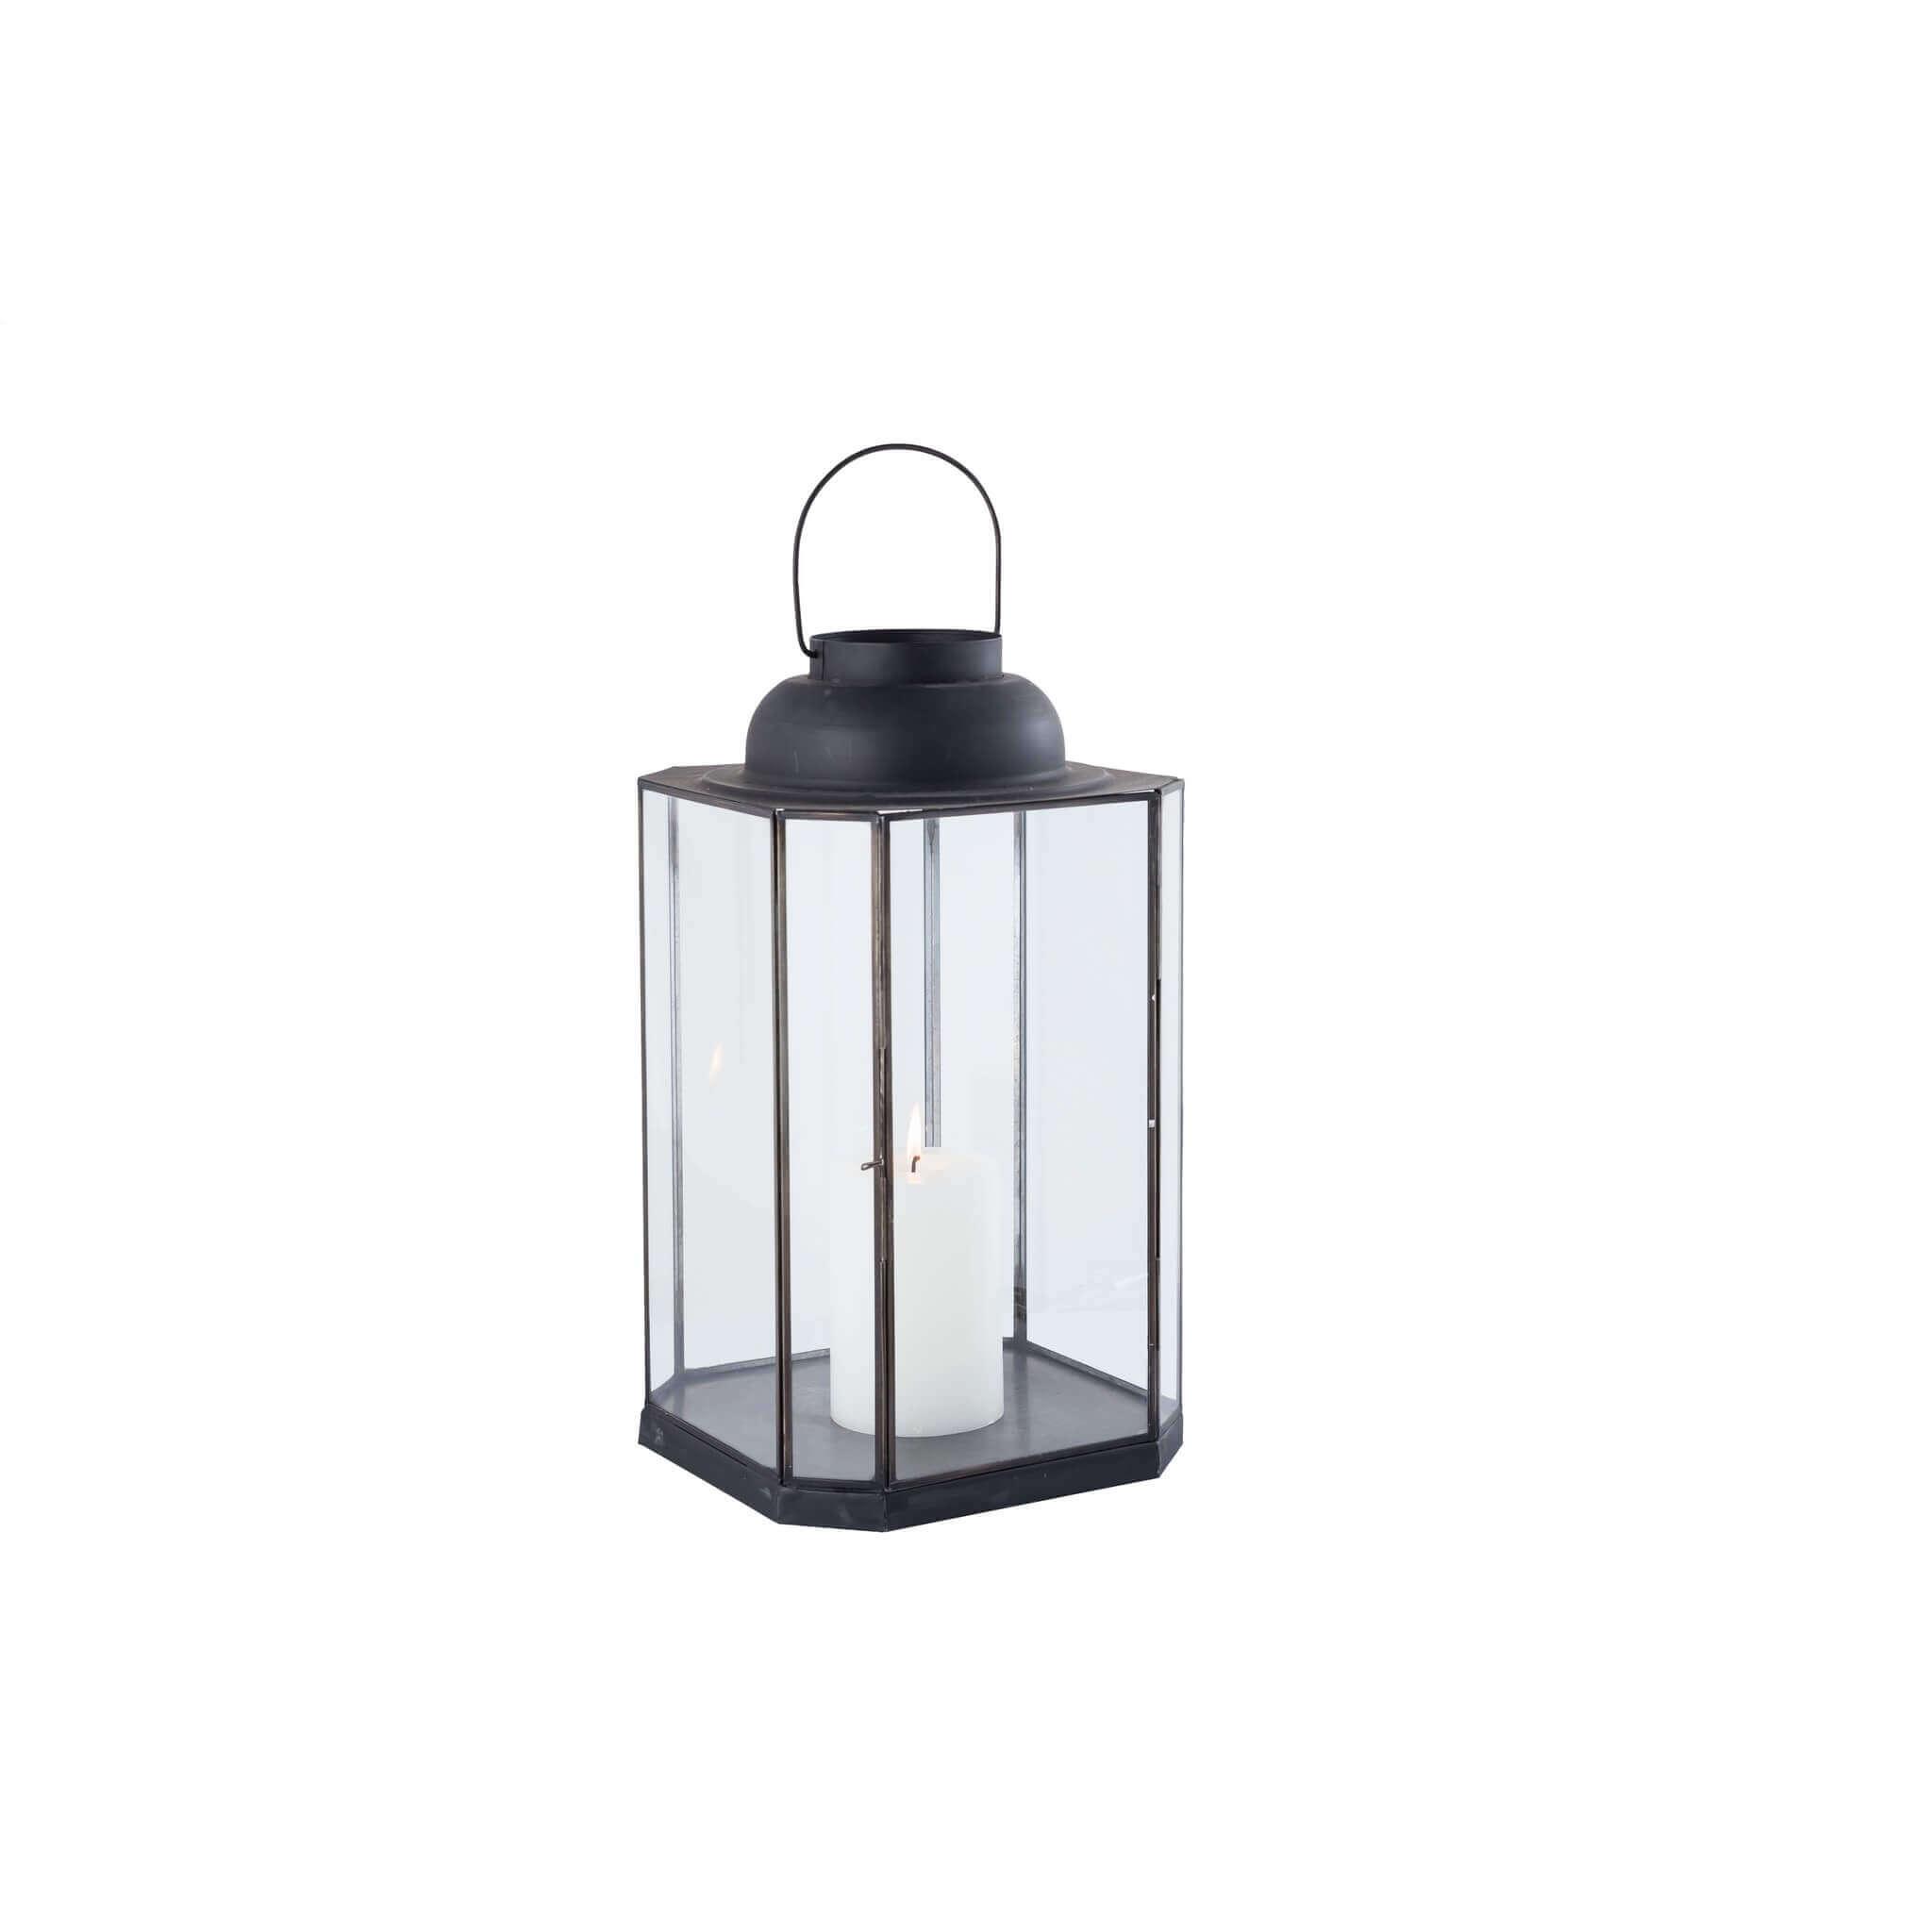 Milani Home APOLLINE - lanterna in vetro e metallo